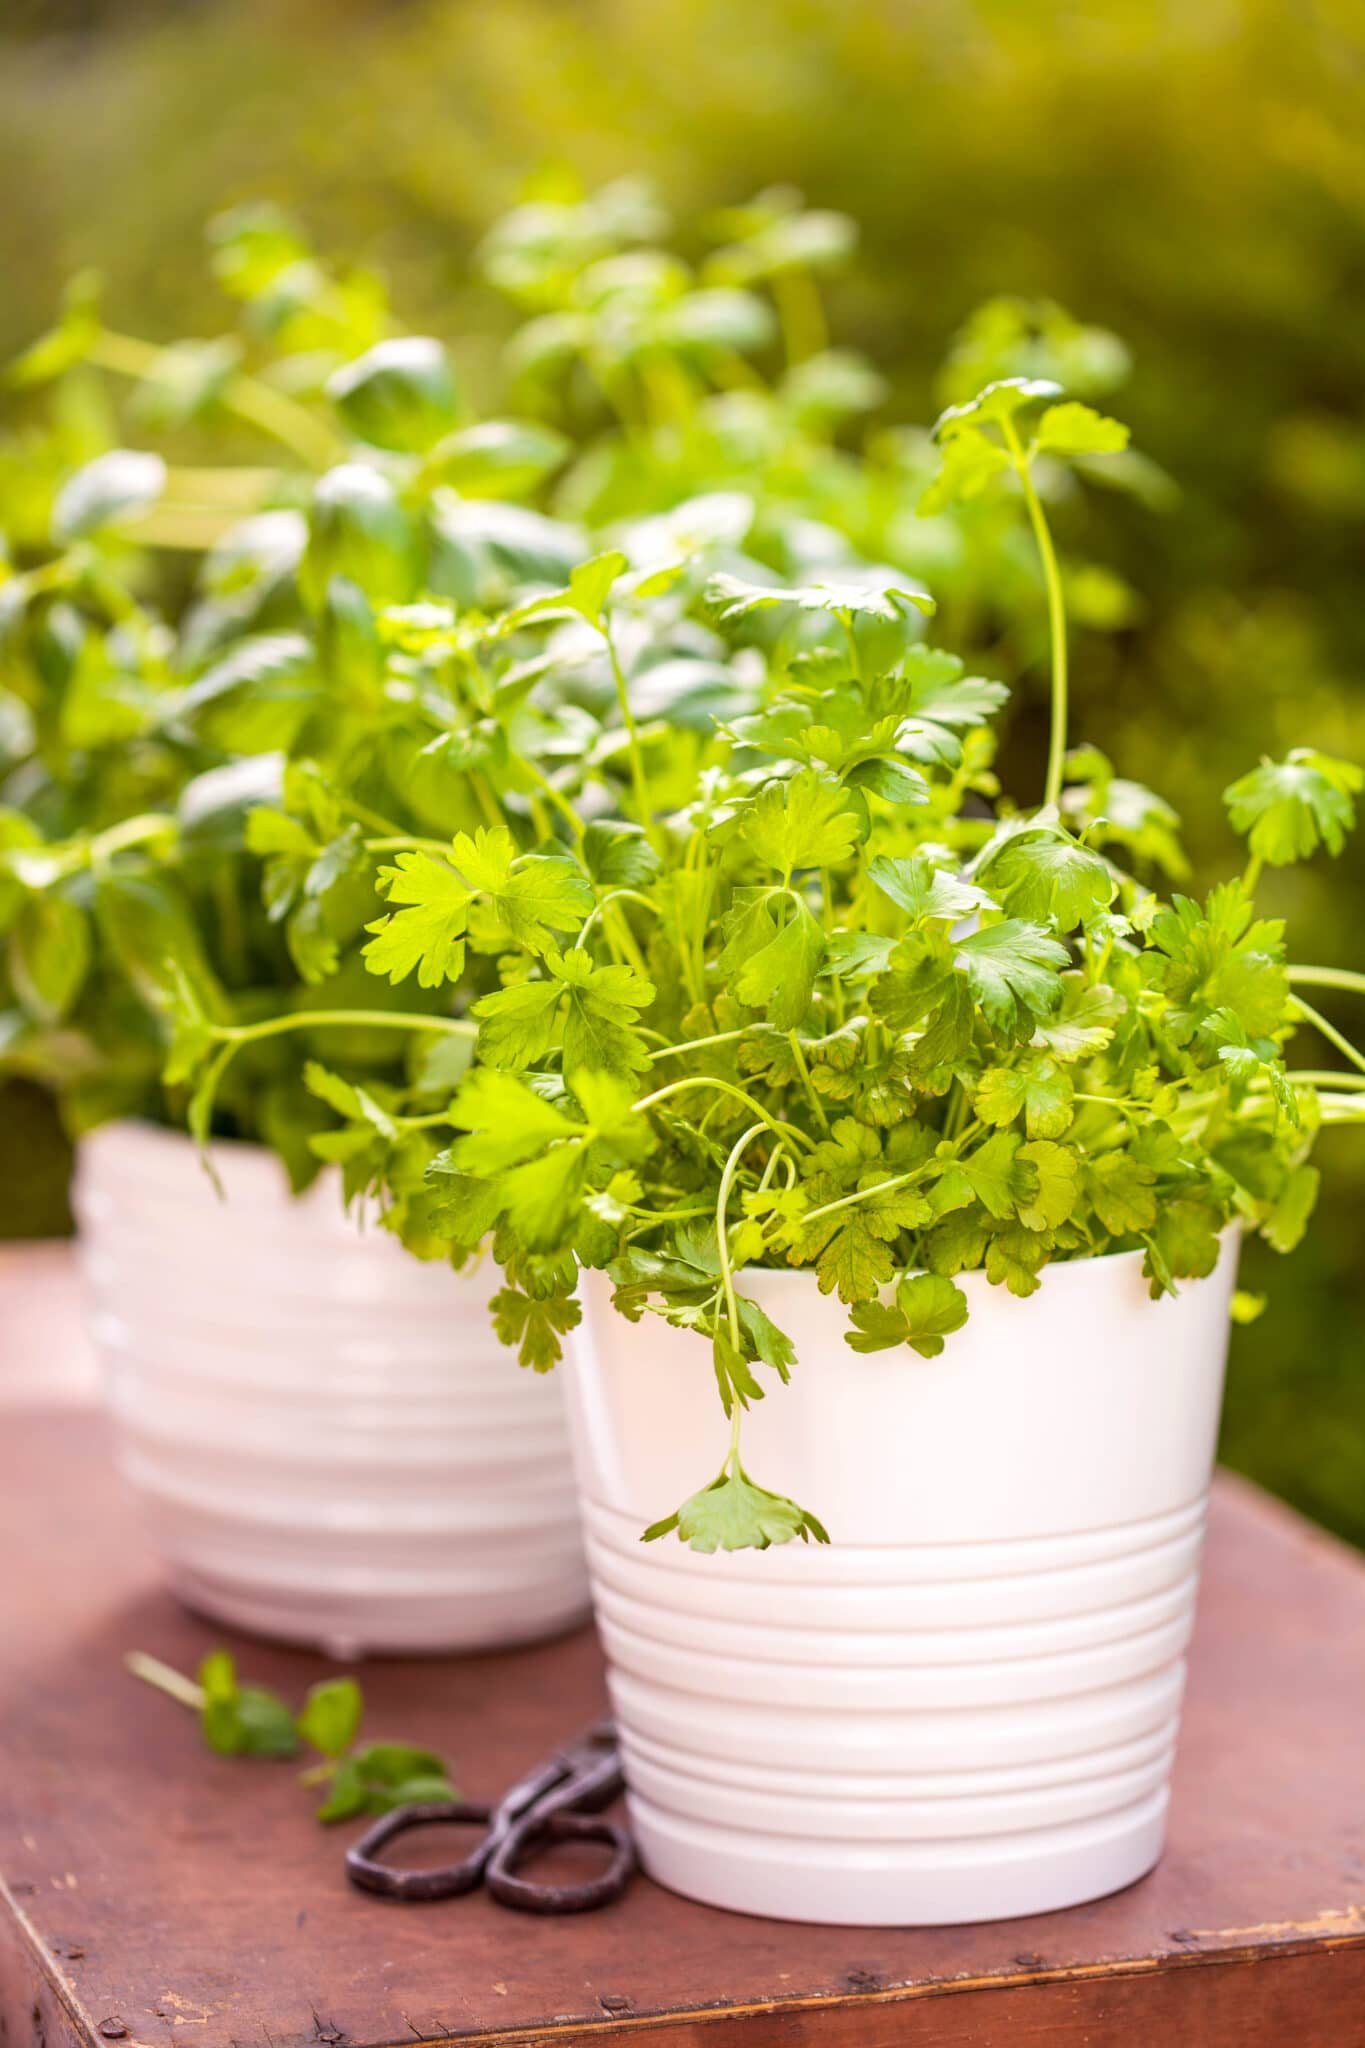 A cilantro plant growing in a pot.